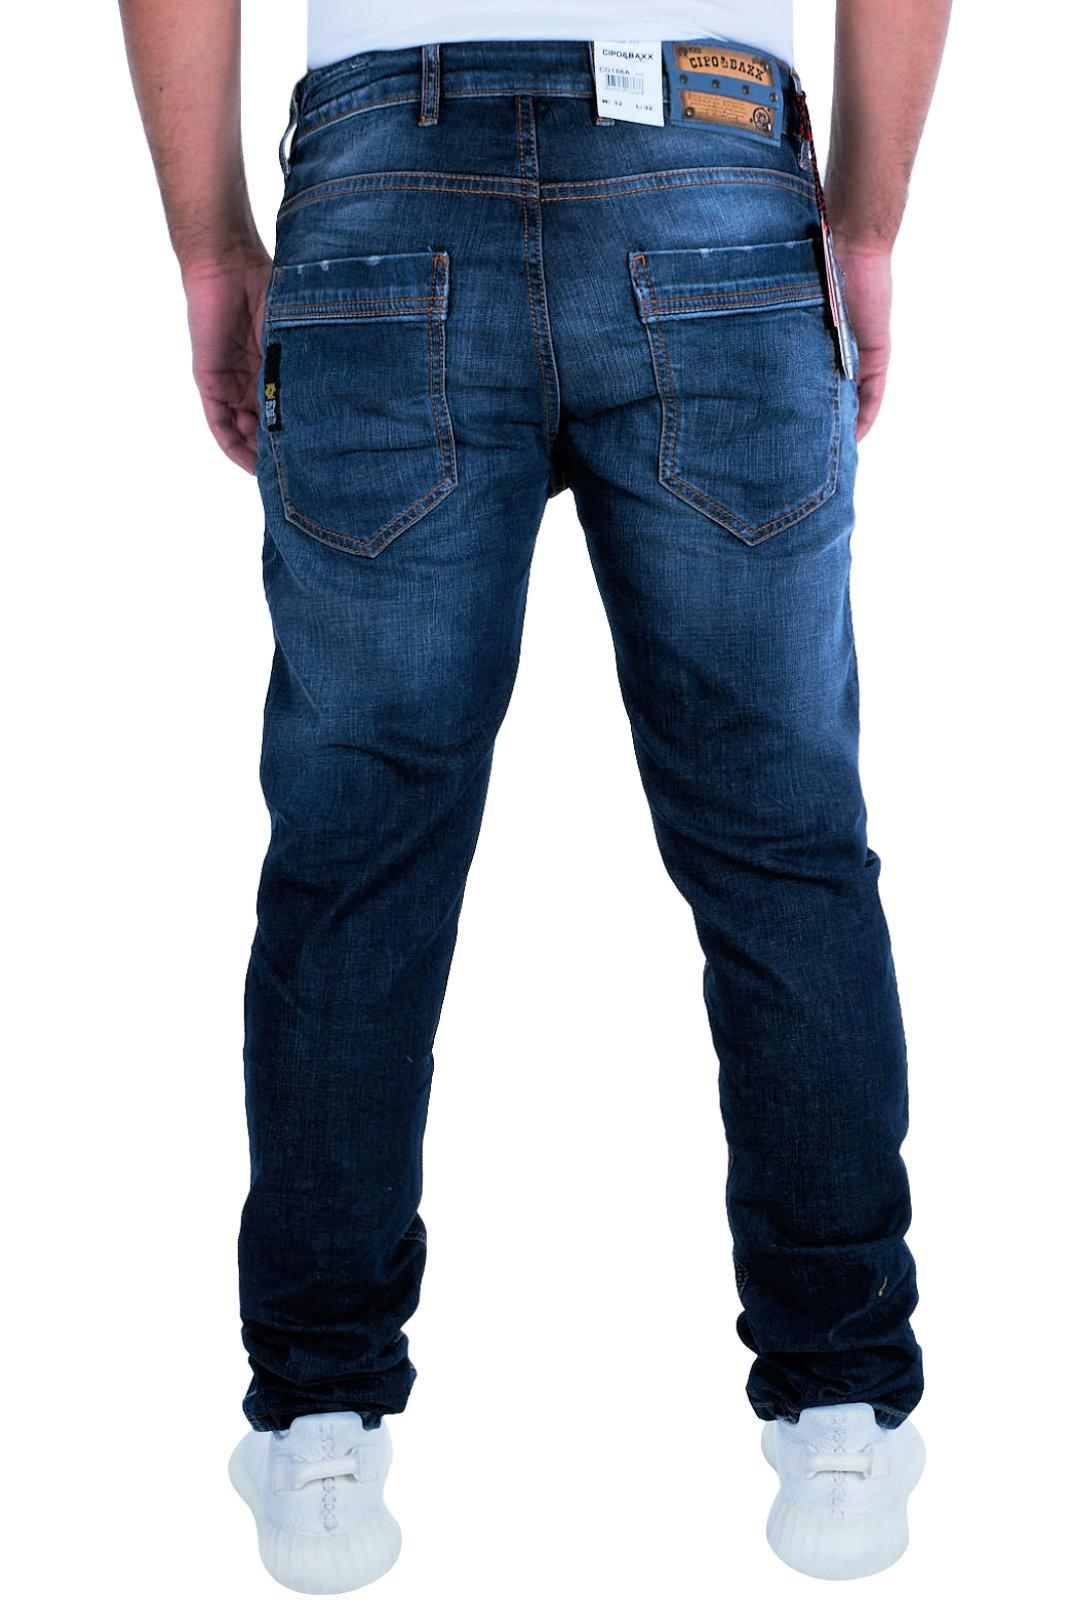 Cd186a Biker Herren Denim Jeans Cipo slimfit Clubwear Baxx Hose HqY0Pw7